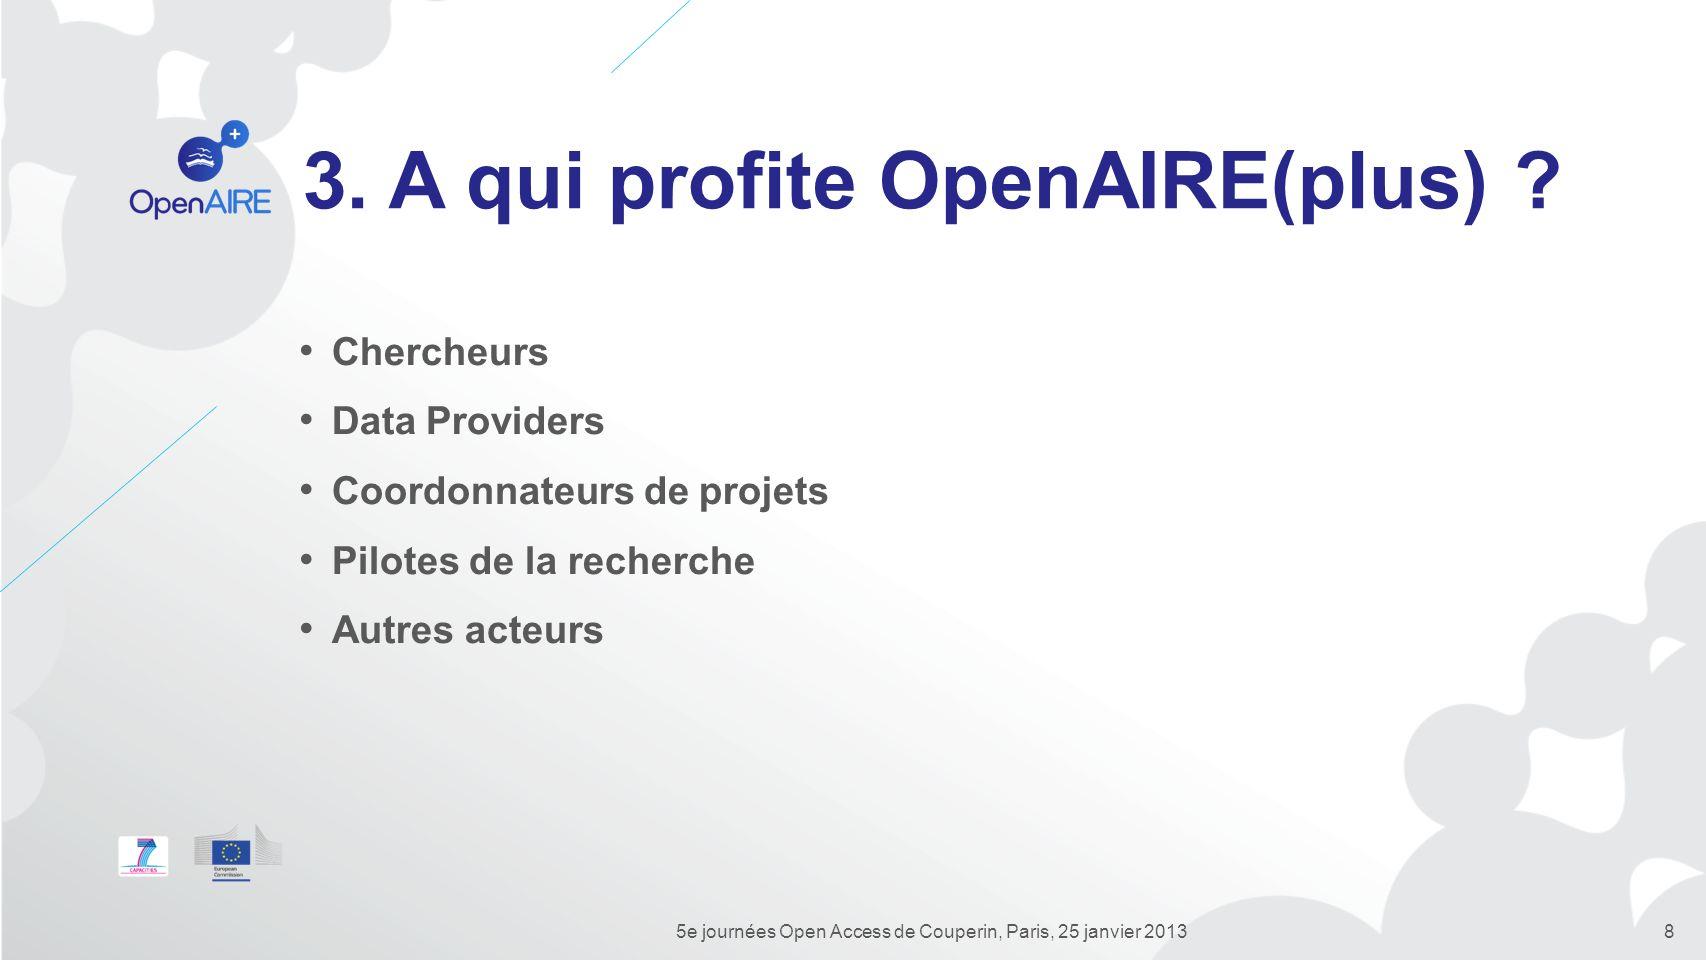 3. A qui profite OpenAIRE(plus)